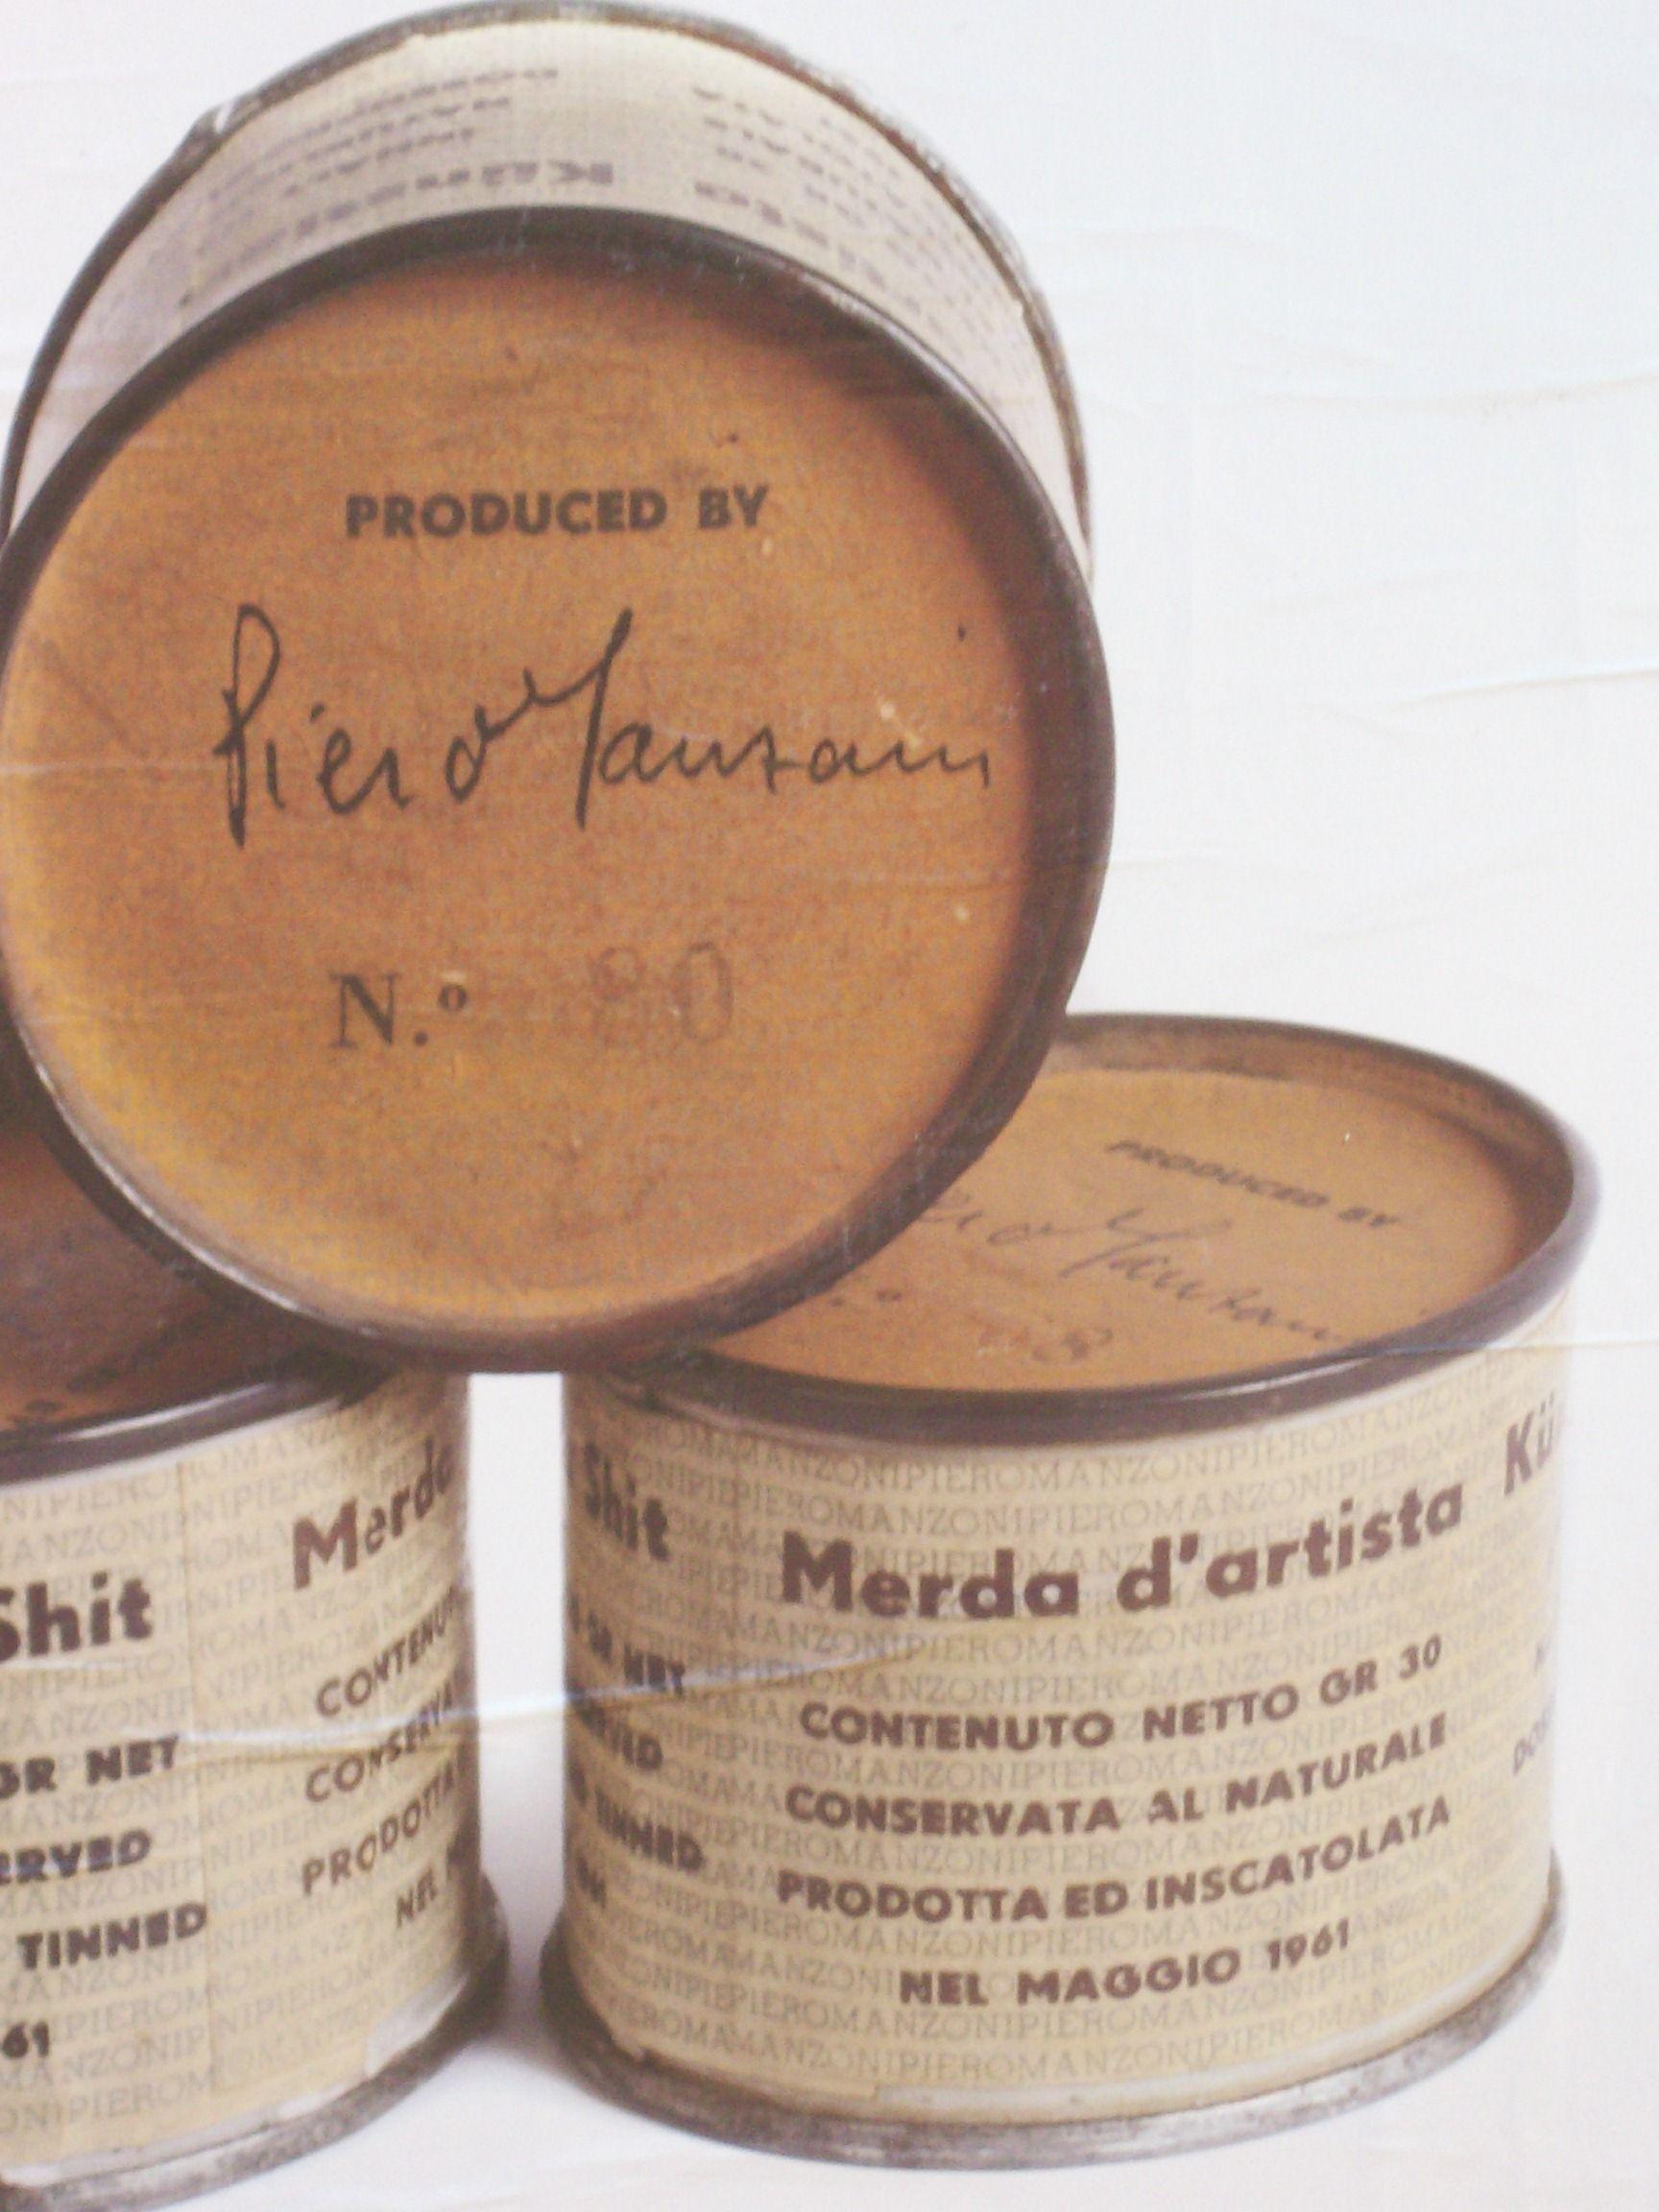 'Mierda de Artista', la obra de arte conceptual que catapultó a Piero Manzoni